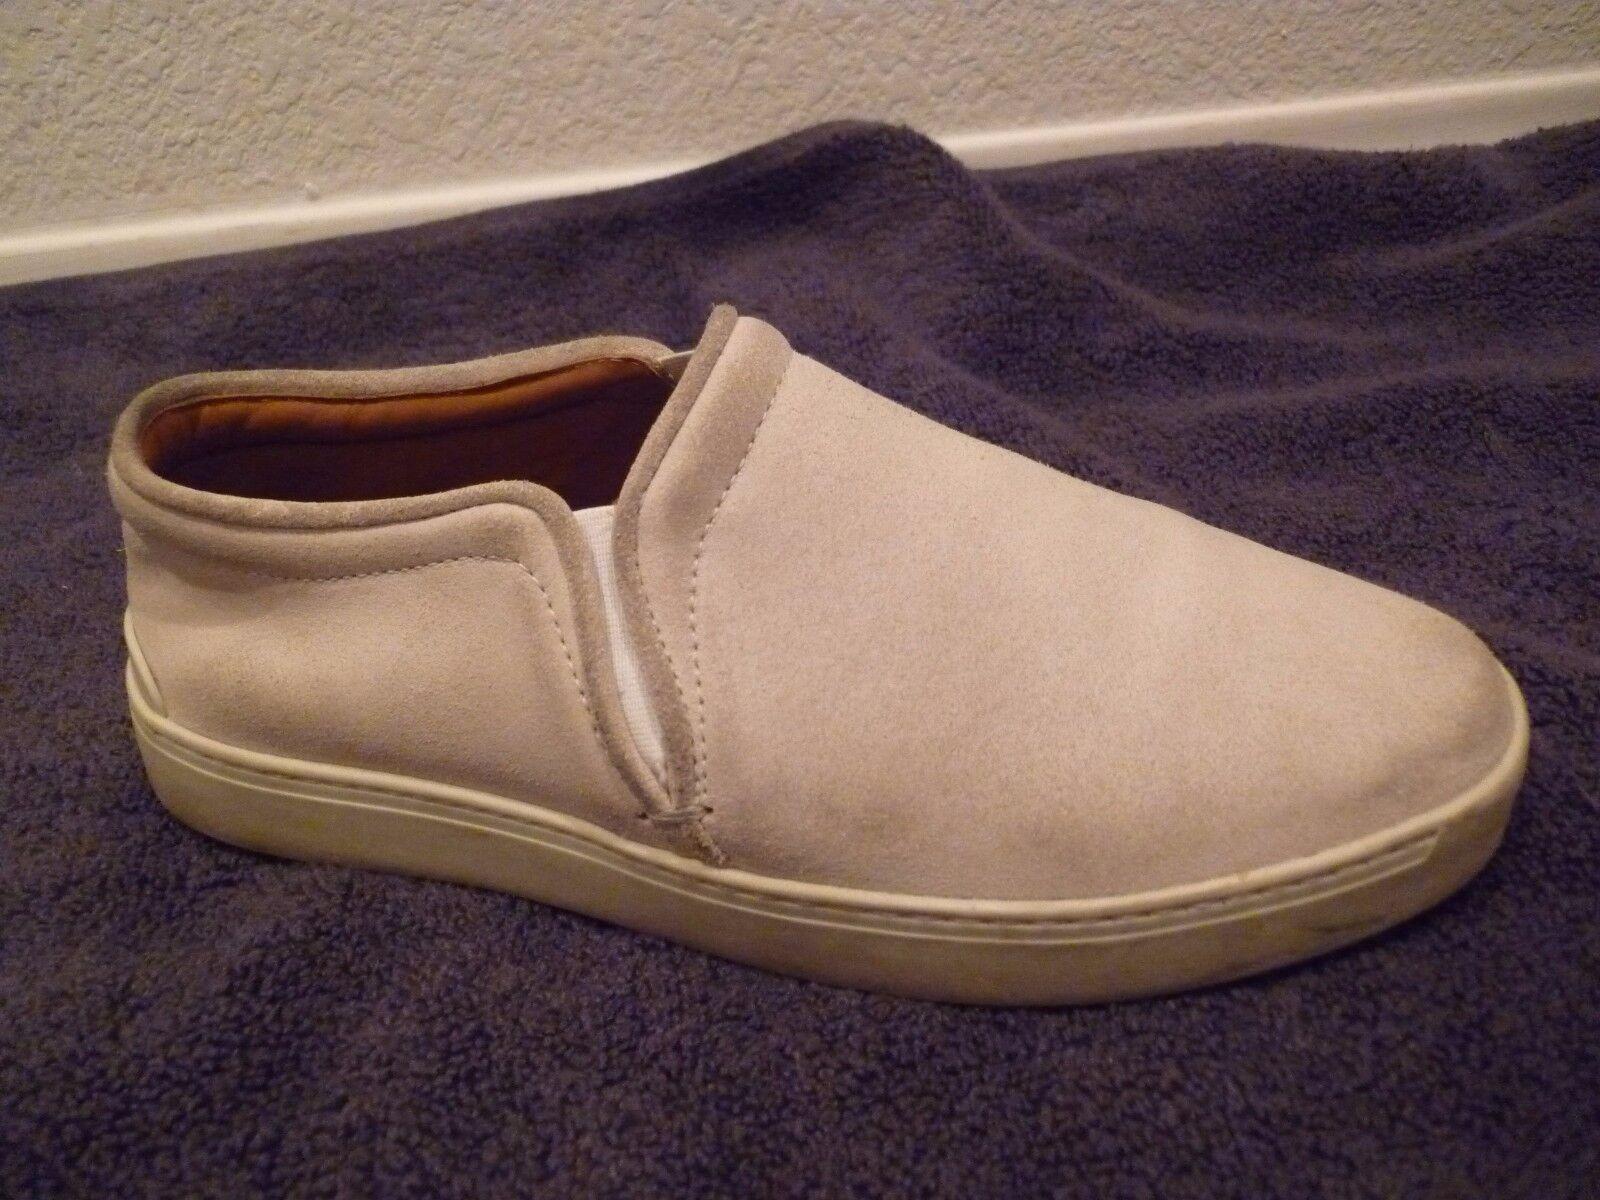 395 Rag & Bone KENT Suede leather stone Slip-On Sneaker Flat shoes SZ 38 8